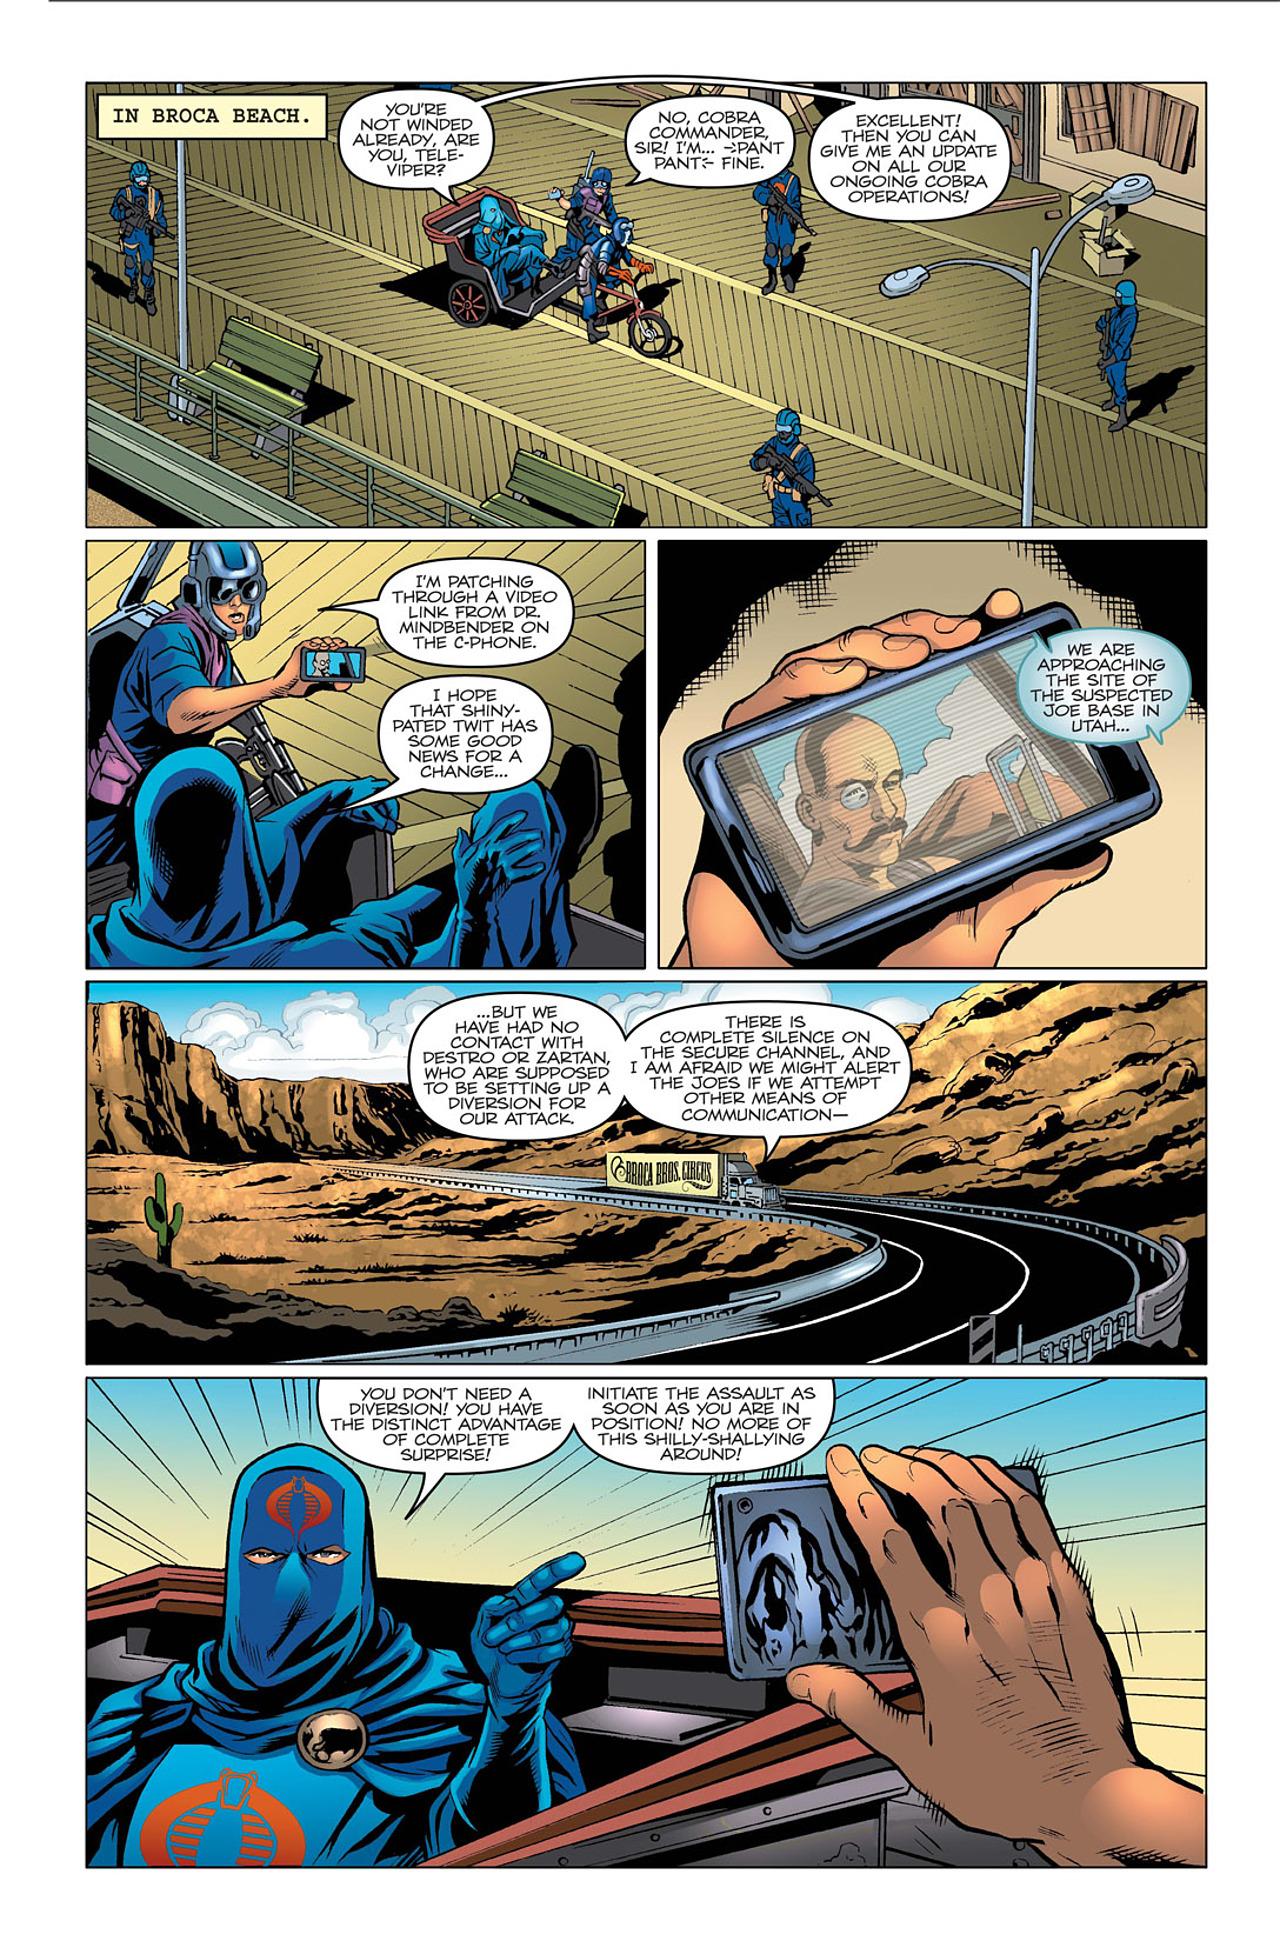 G.I. Joe: A Real American Hero 164 Page 8